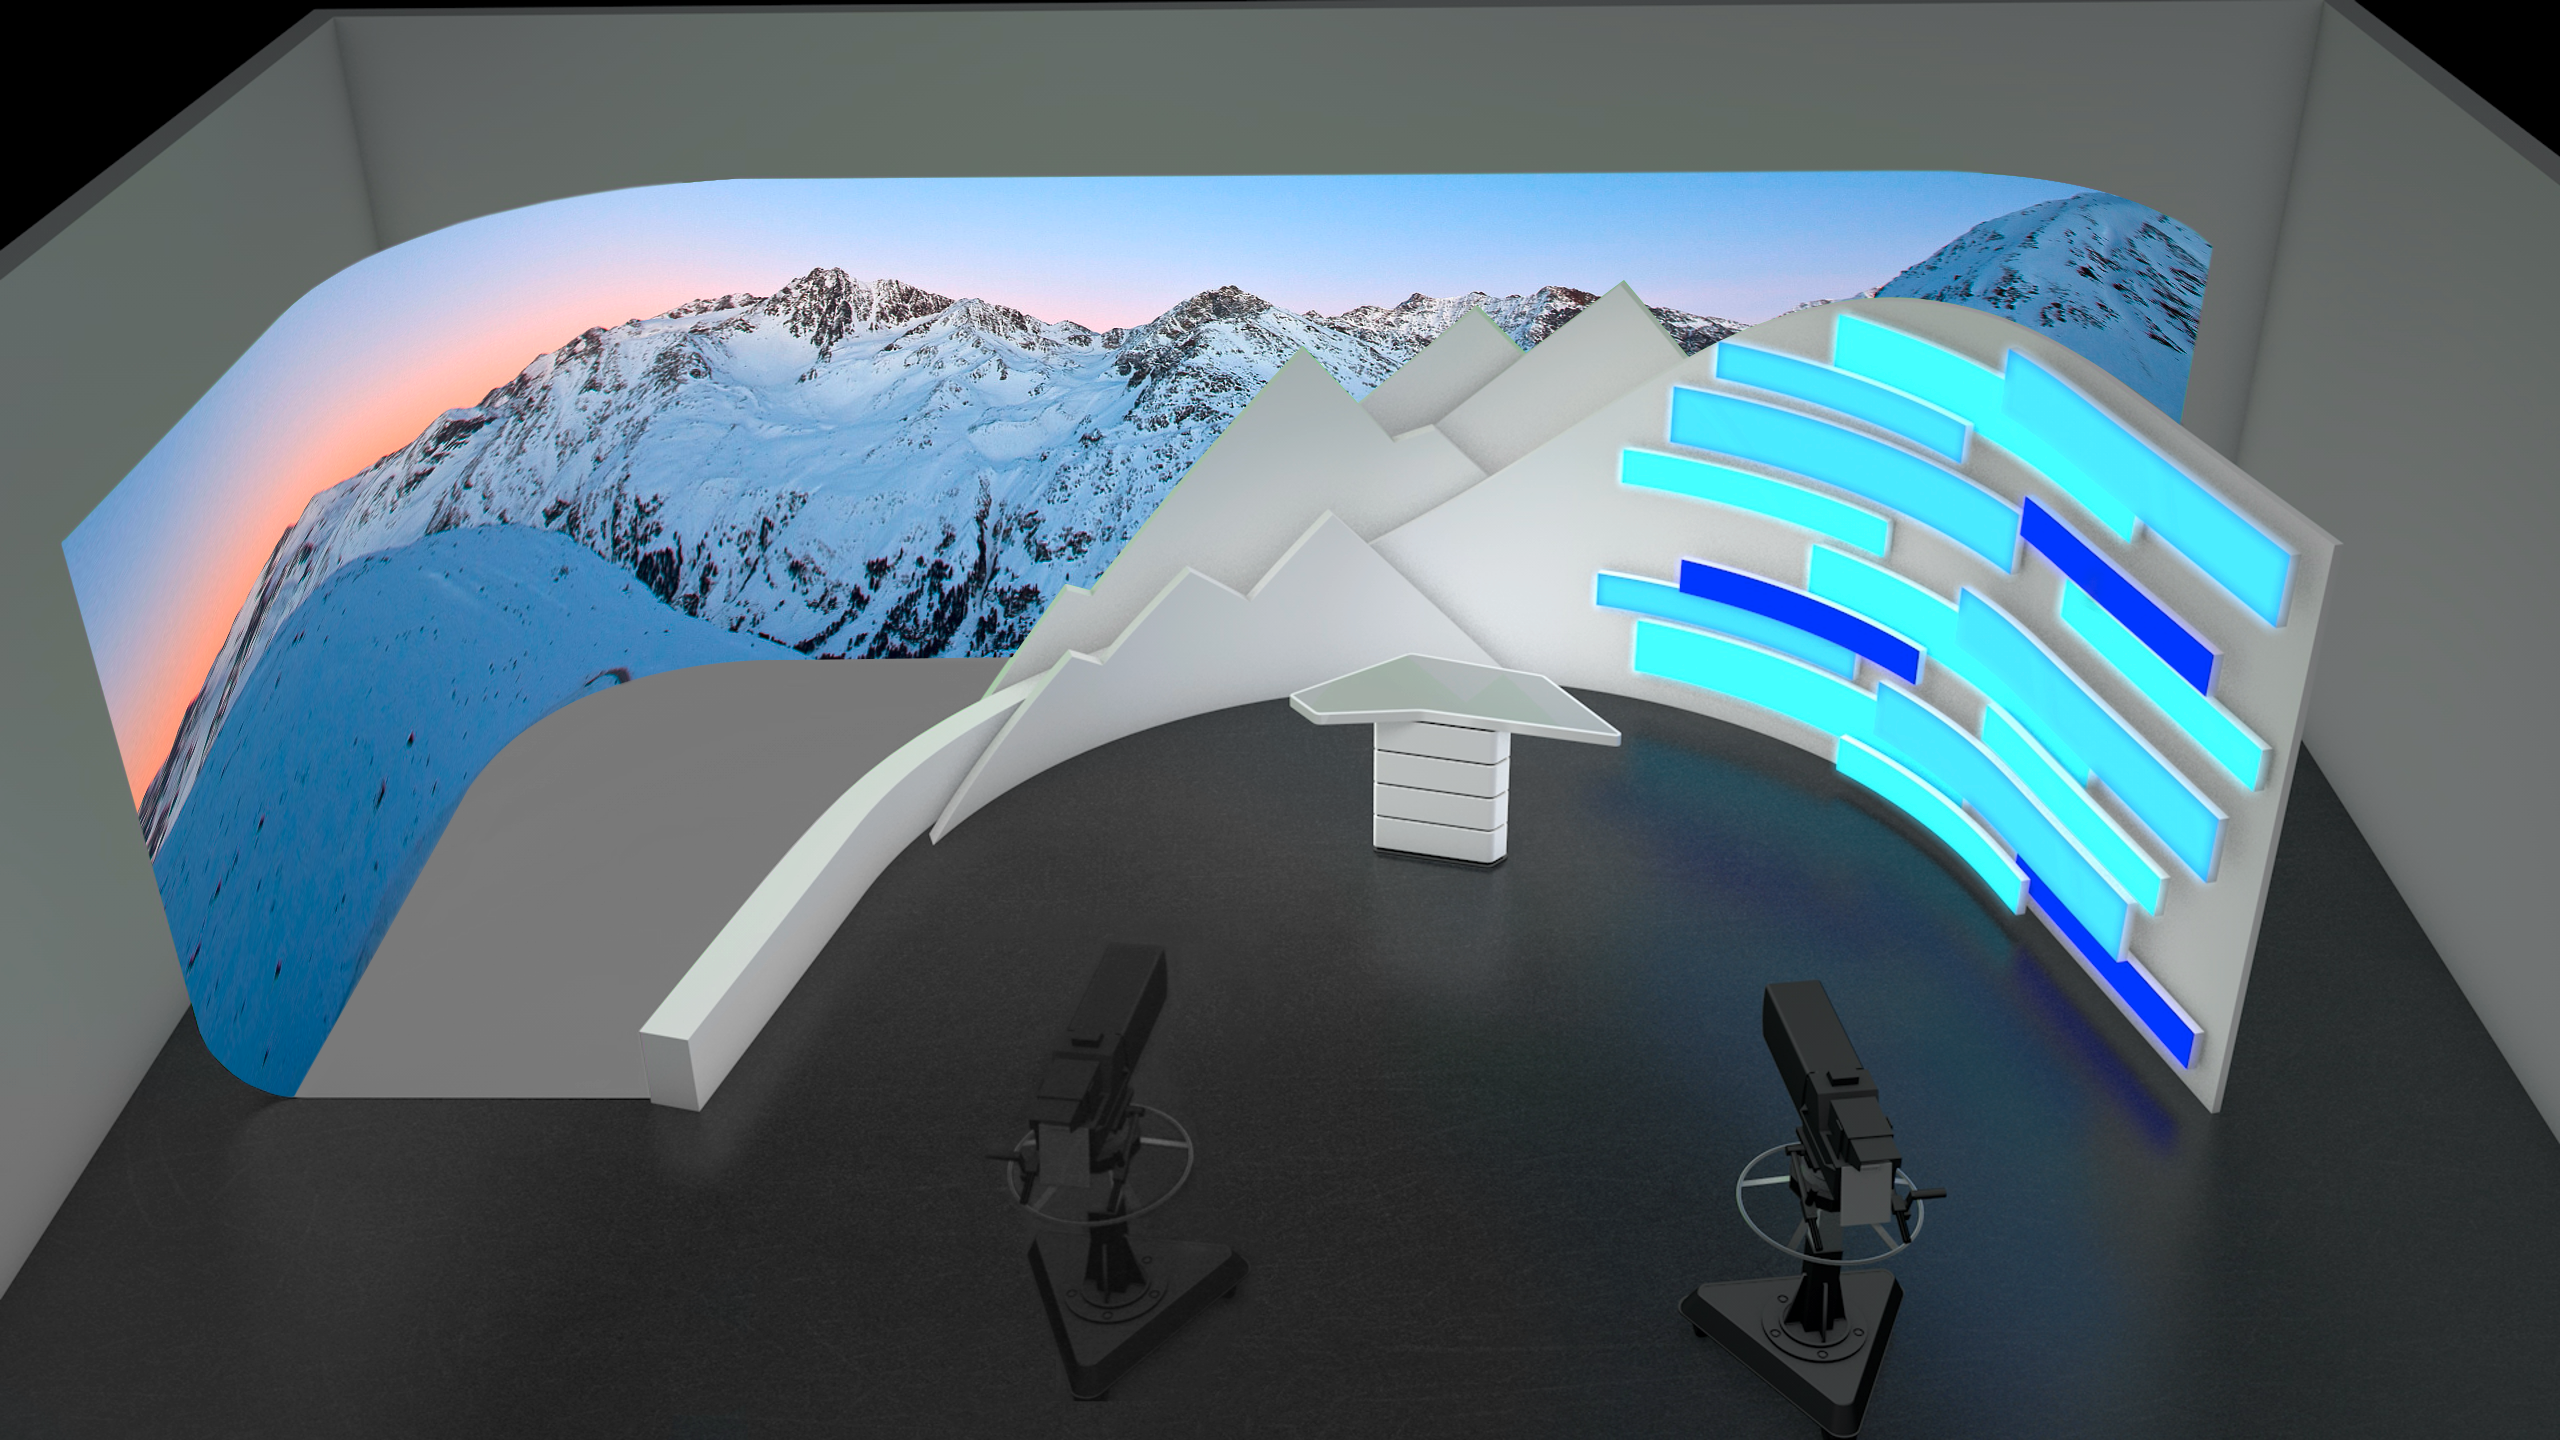 Modular studio design for live TV formats